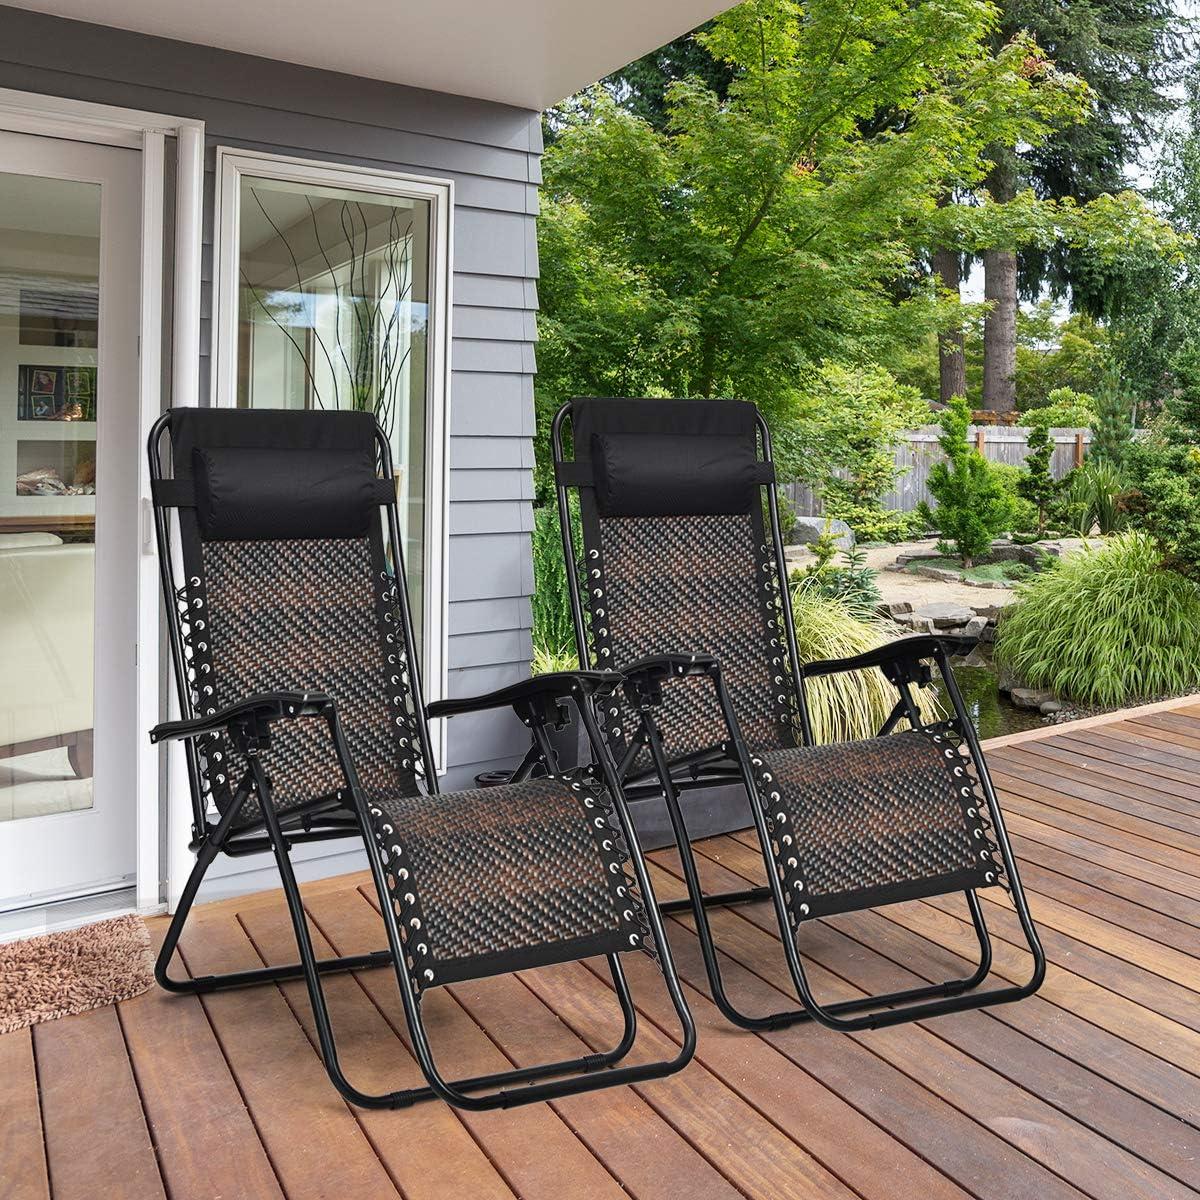 Buy Tangkula Patio Rattan Zero Gravity Lounge Chair, Outdoor ...